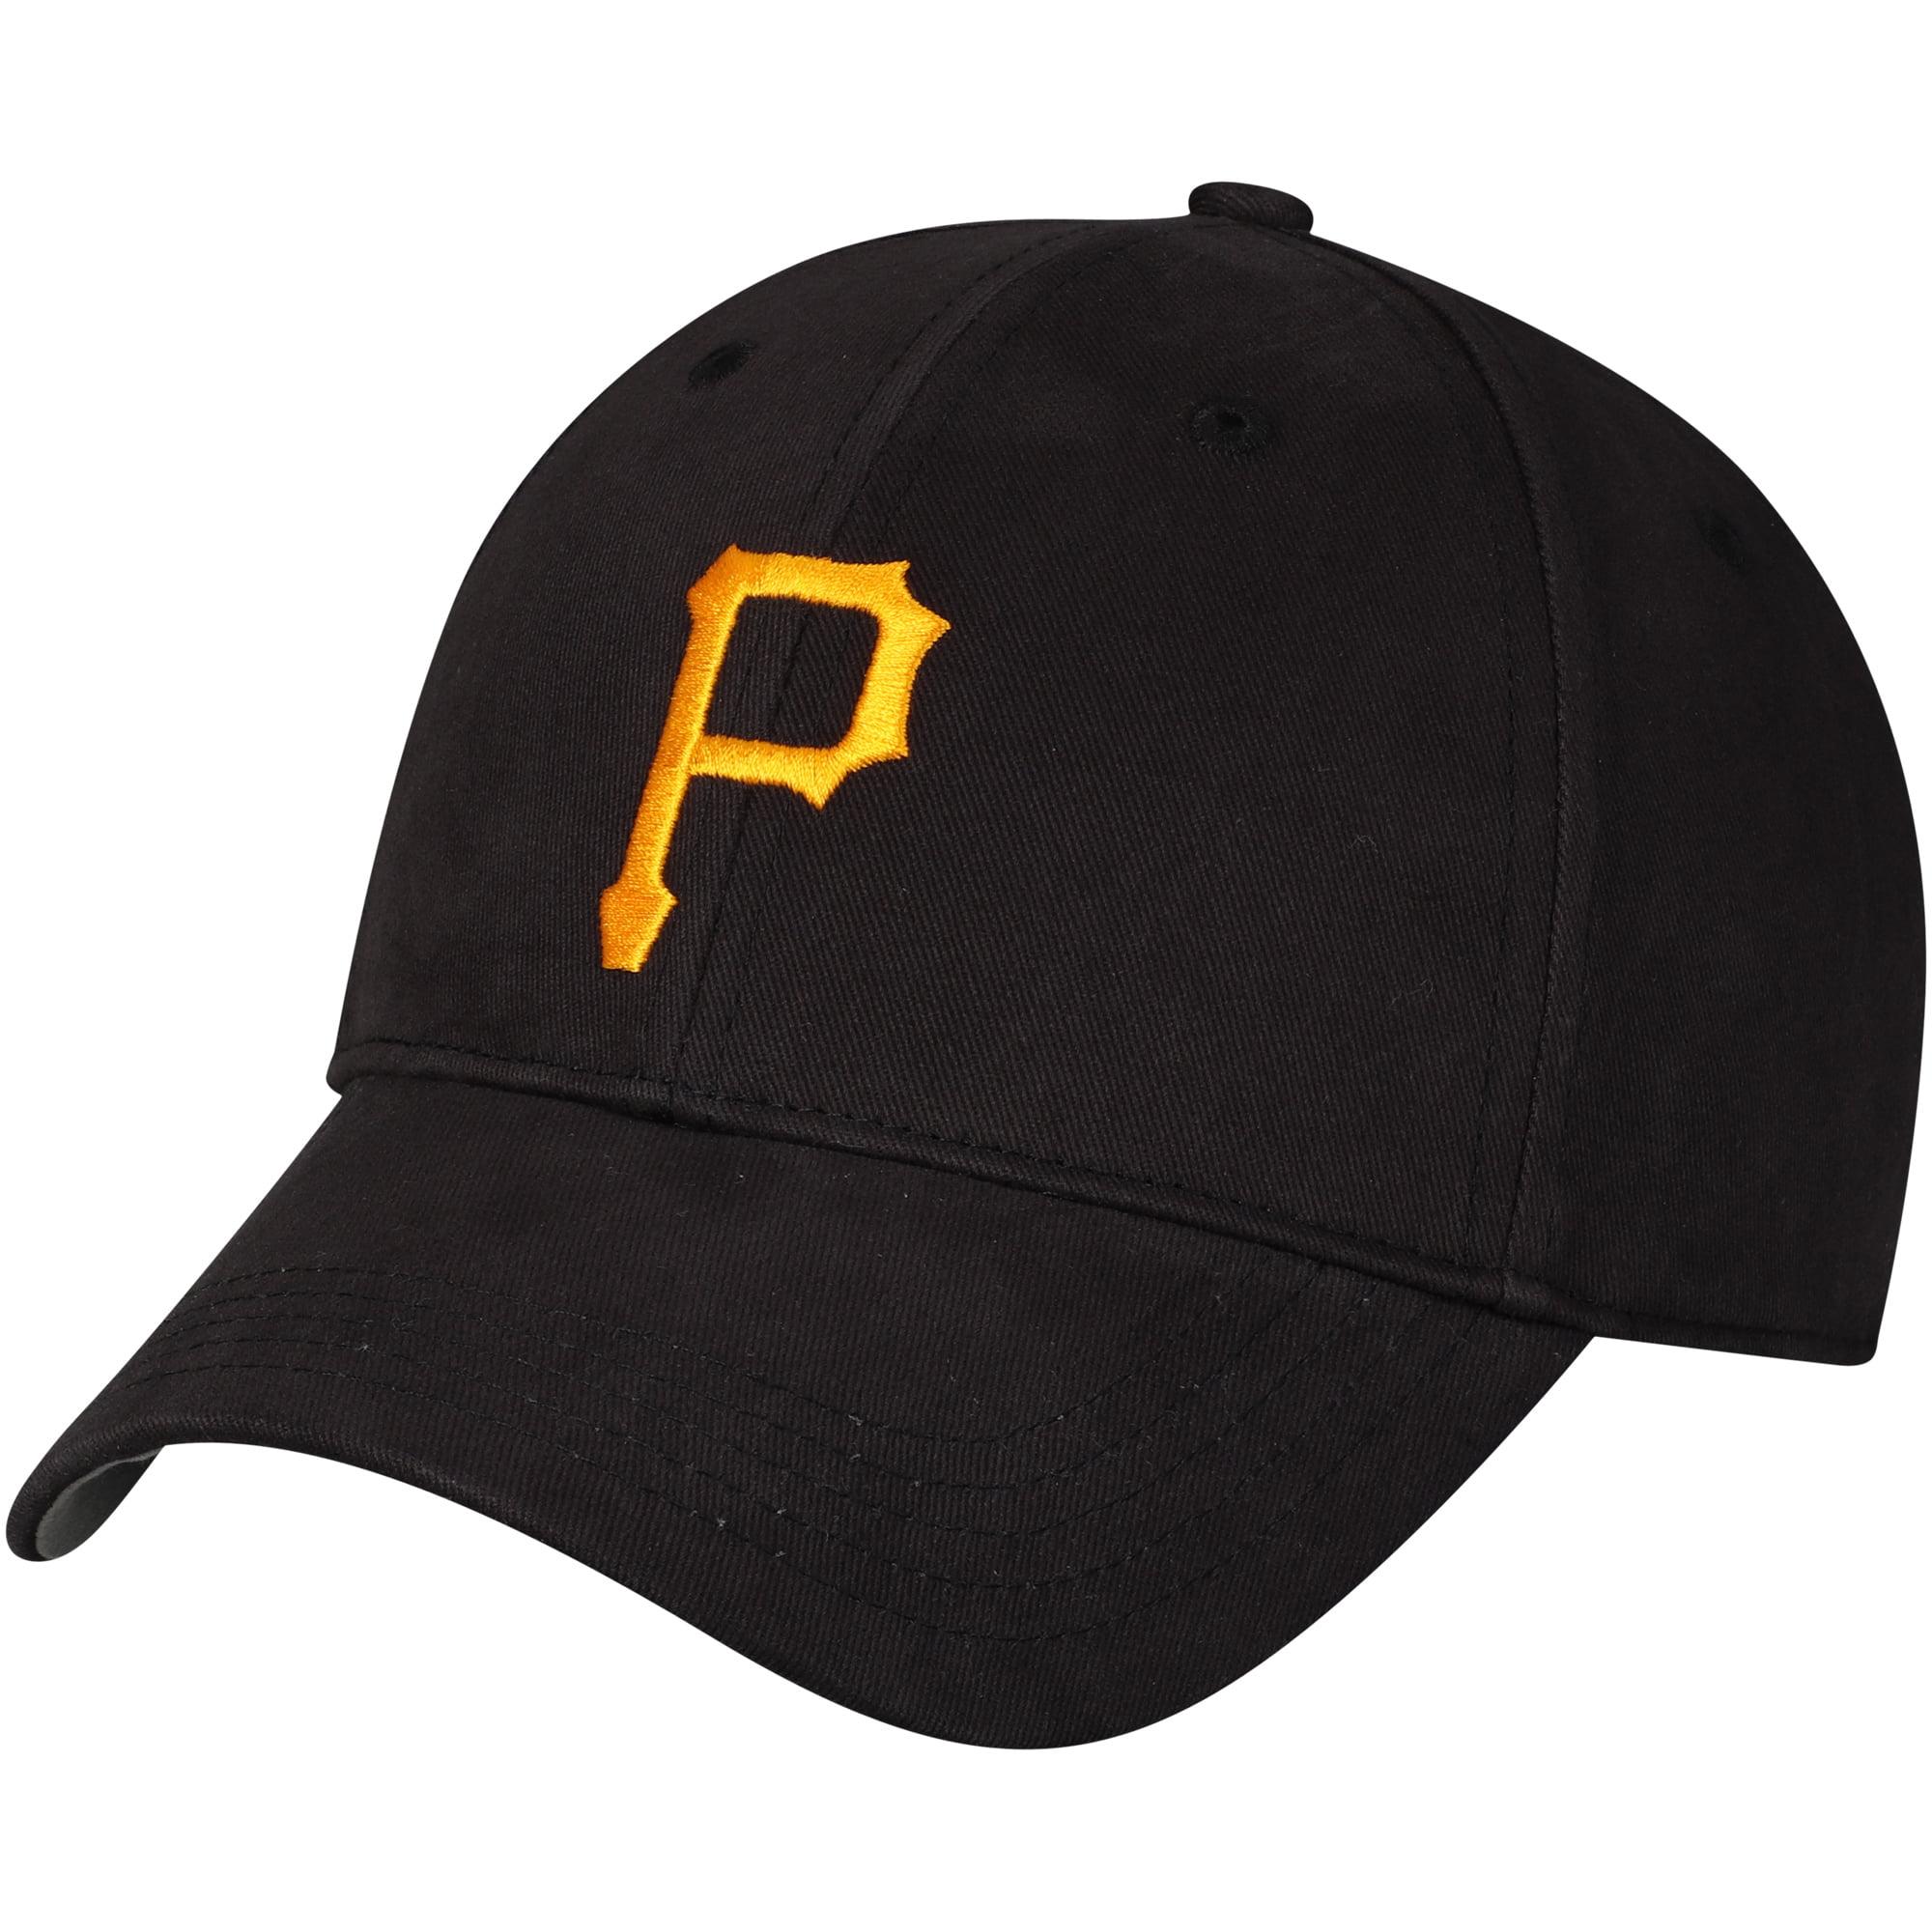 Pittsburgh Pirates Fan Favorite Youth Basic Adjustable Hat - Black - OSFA